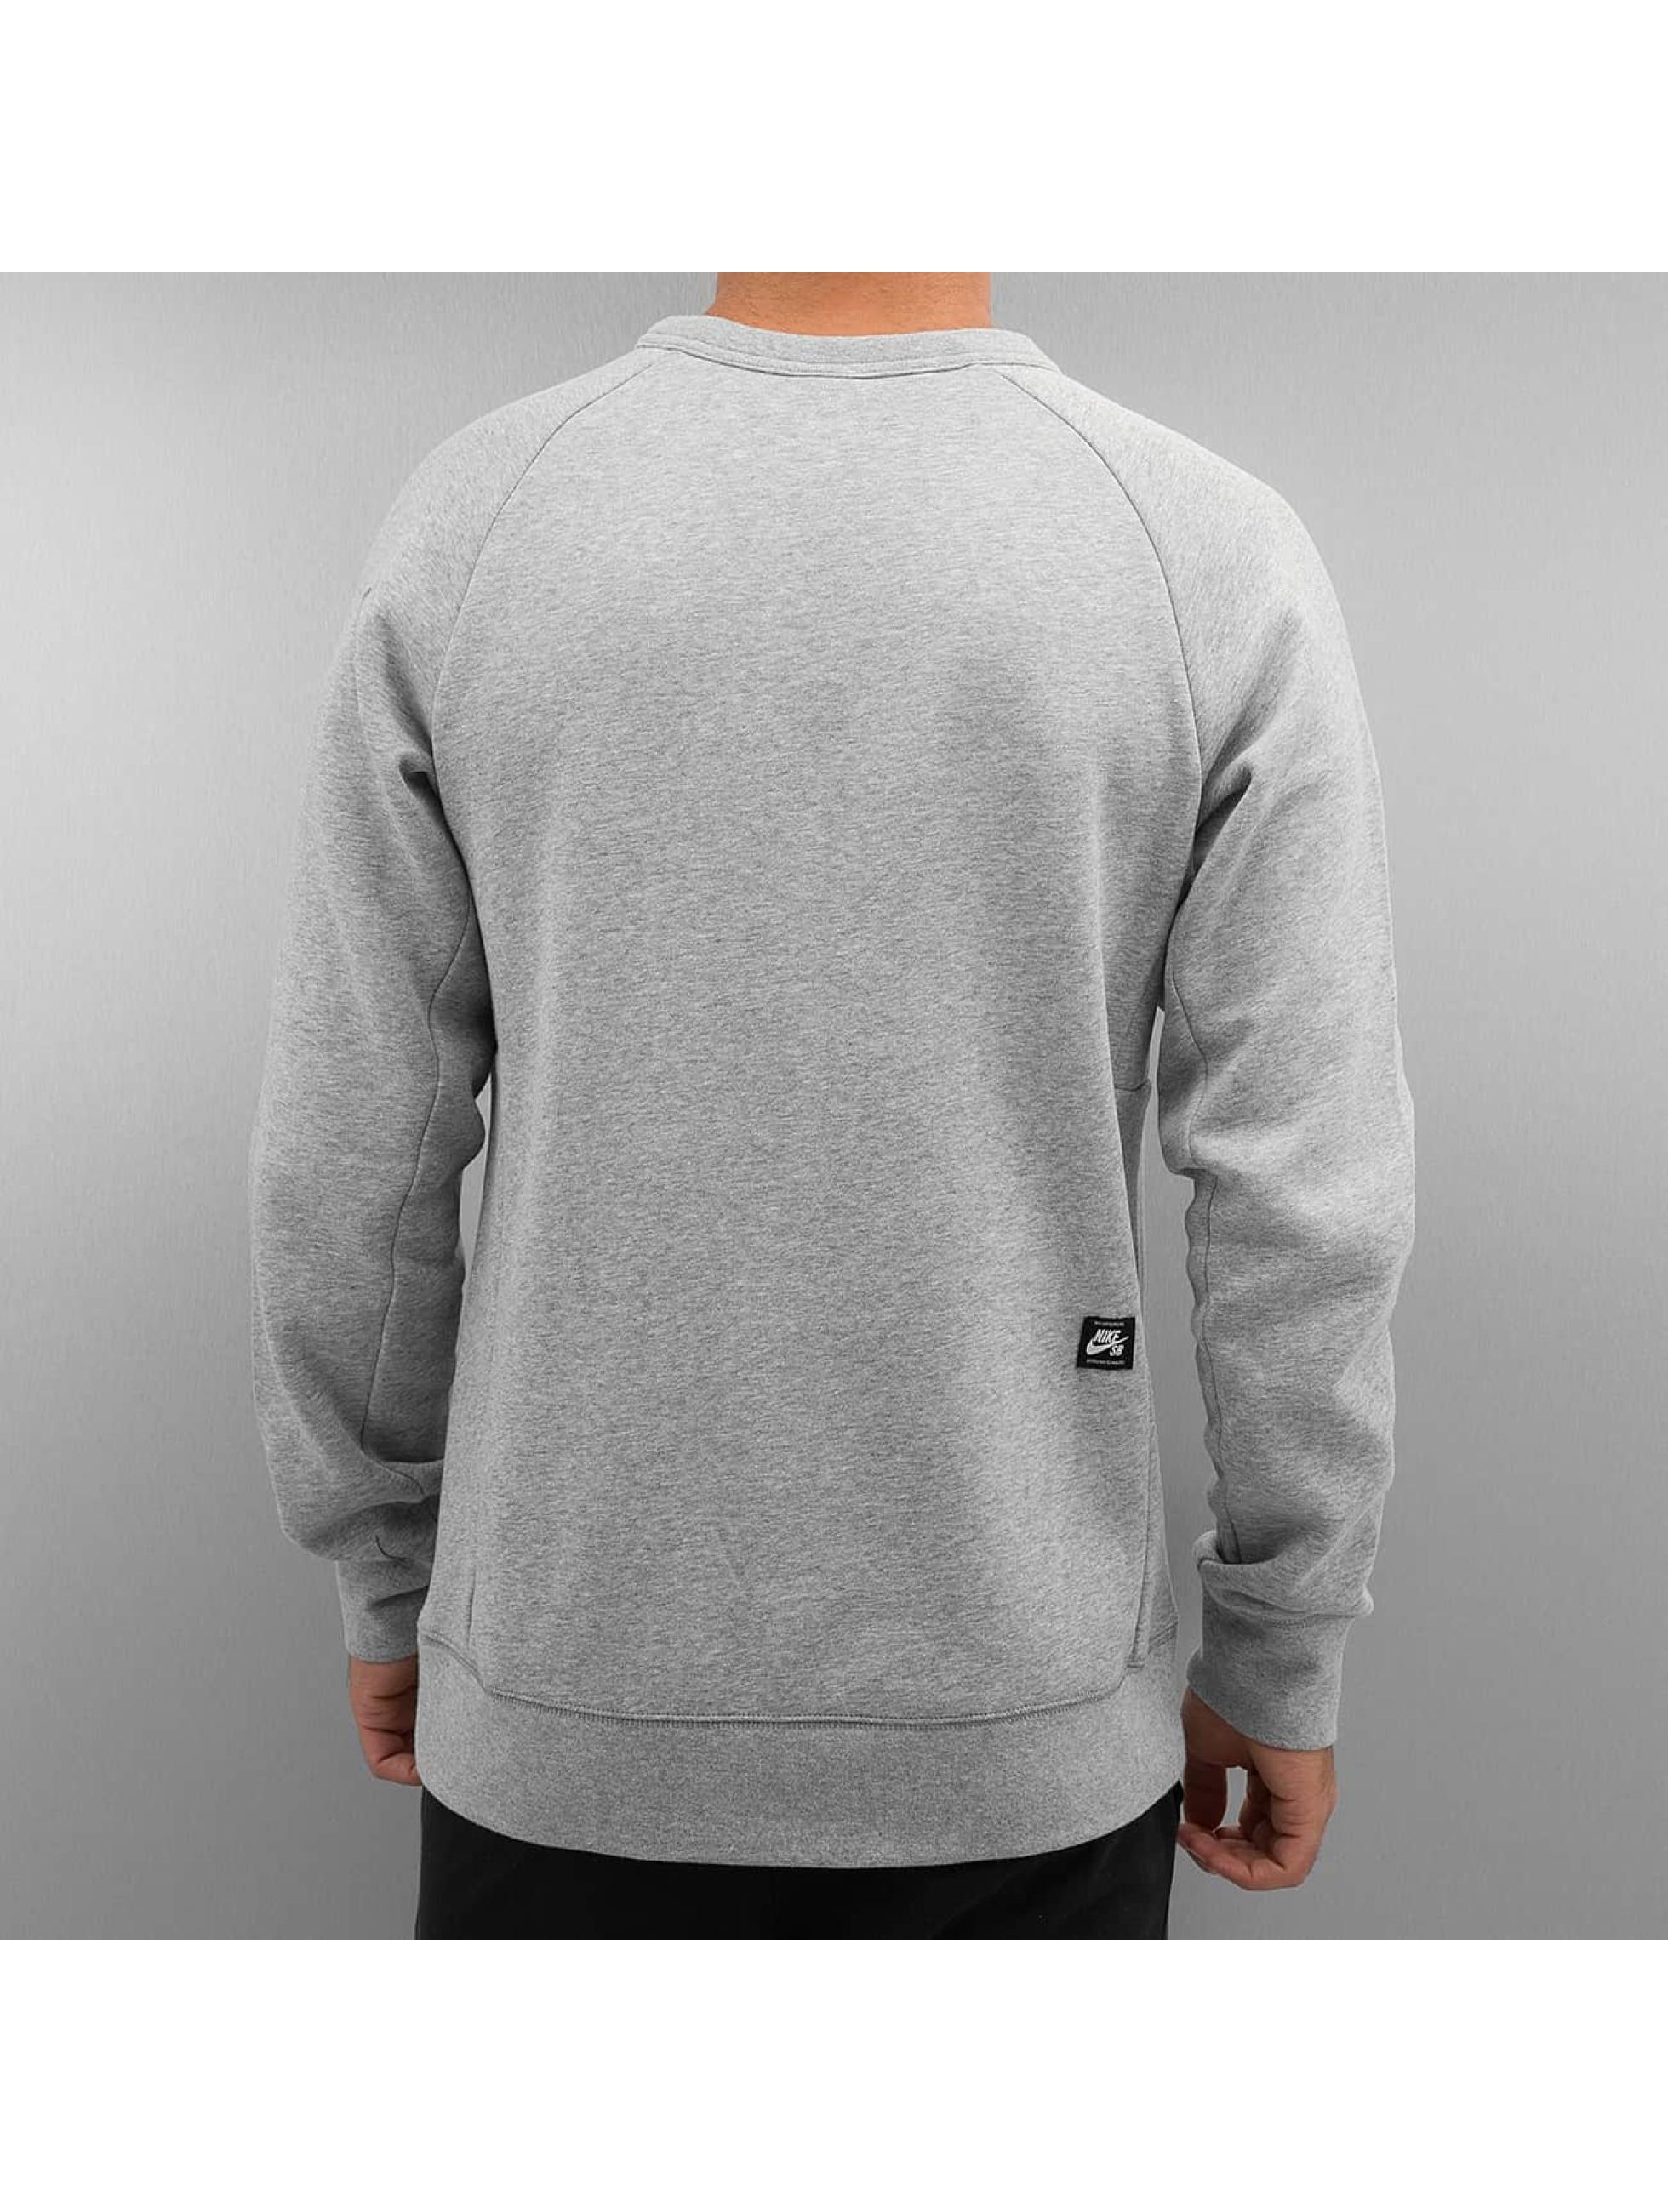 Nike SB Gensre SB Icon grå